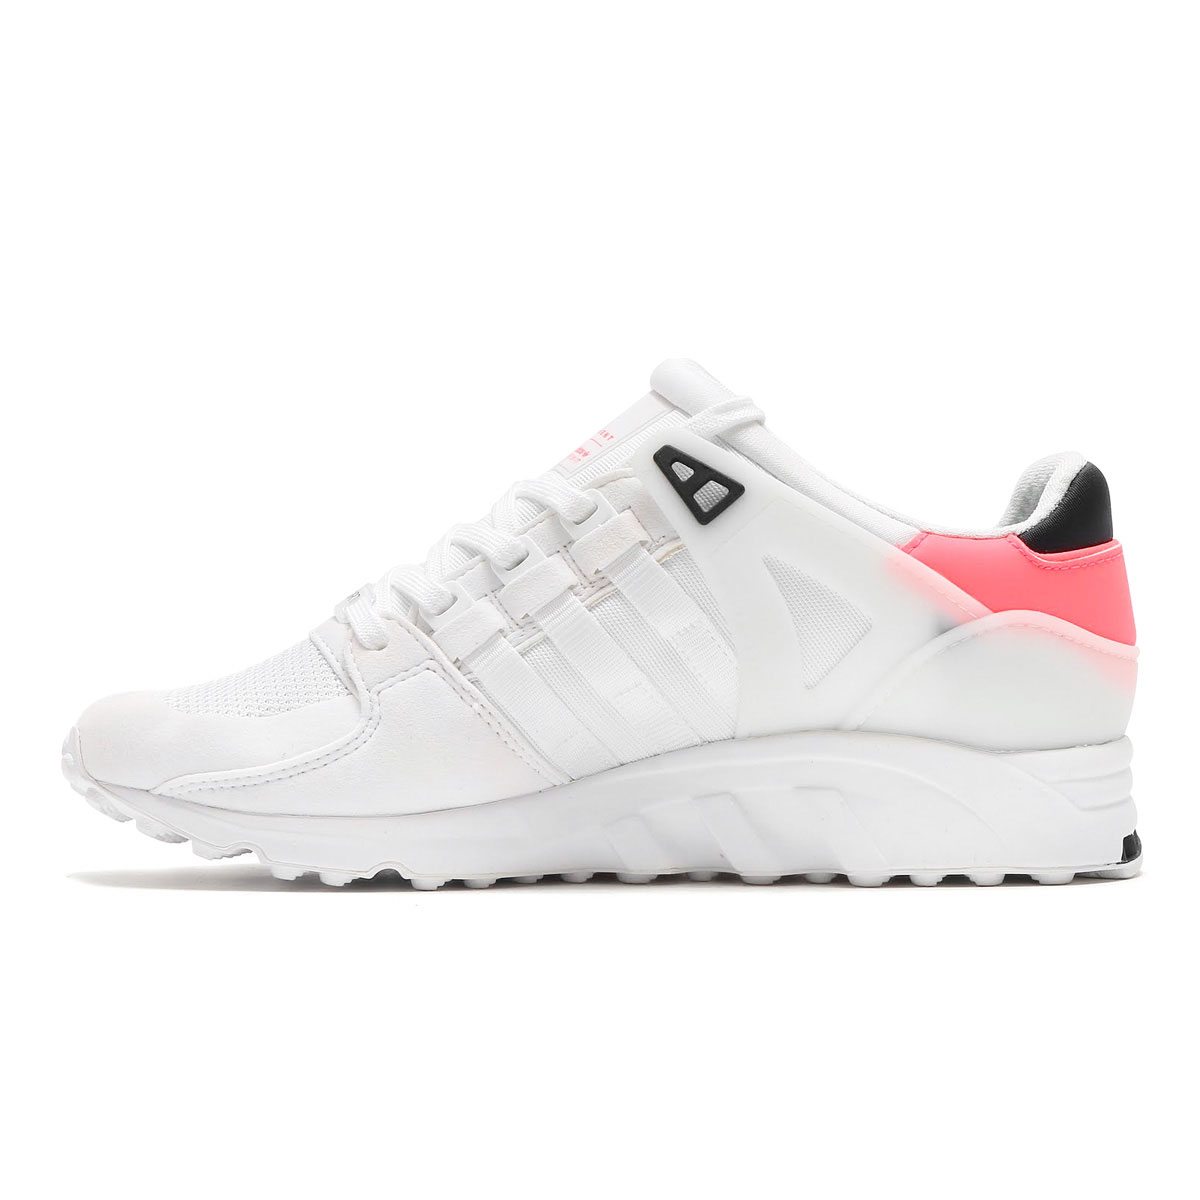 super popular 476c3 b76b6 adidas Originals EQT SUPPORT RF (Adidas original Sue ticket men Tosa port) (Running  WhiteRunning WhiteTurbo)